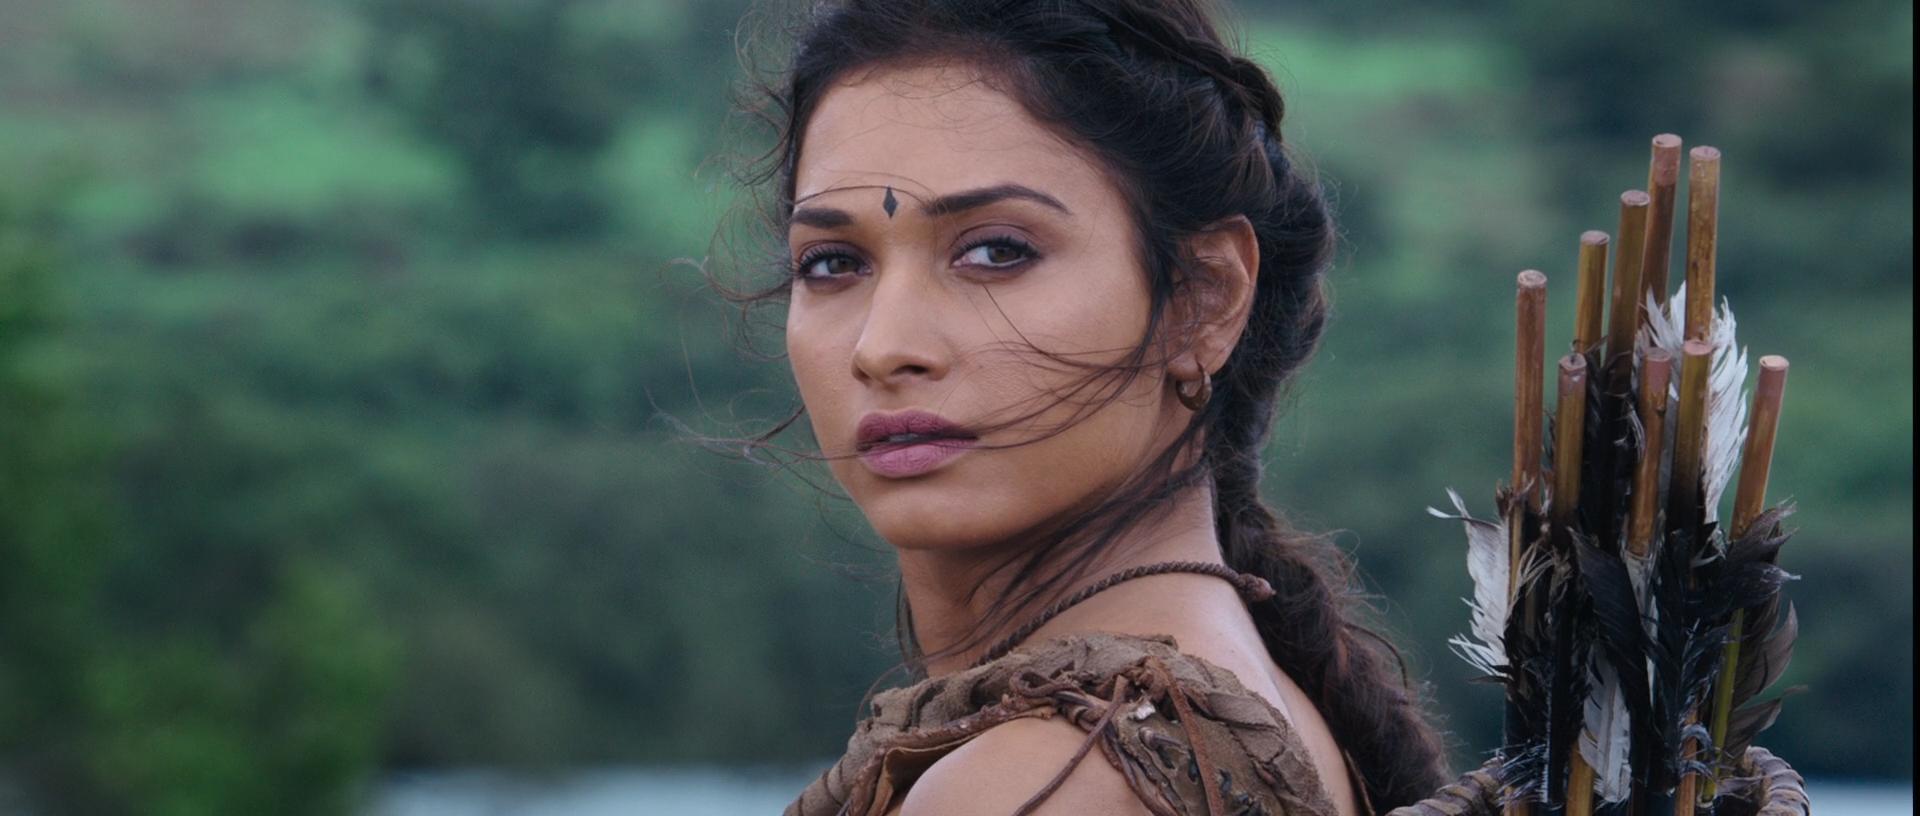 Baahubali: Başlangıç  - Baahubali: The Beginning 2015 (1080p BluRay) DUAL TR-EN - Full HD Film indir